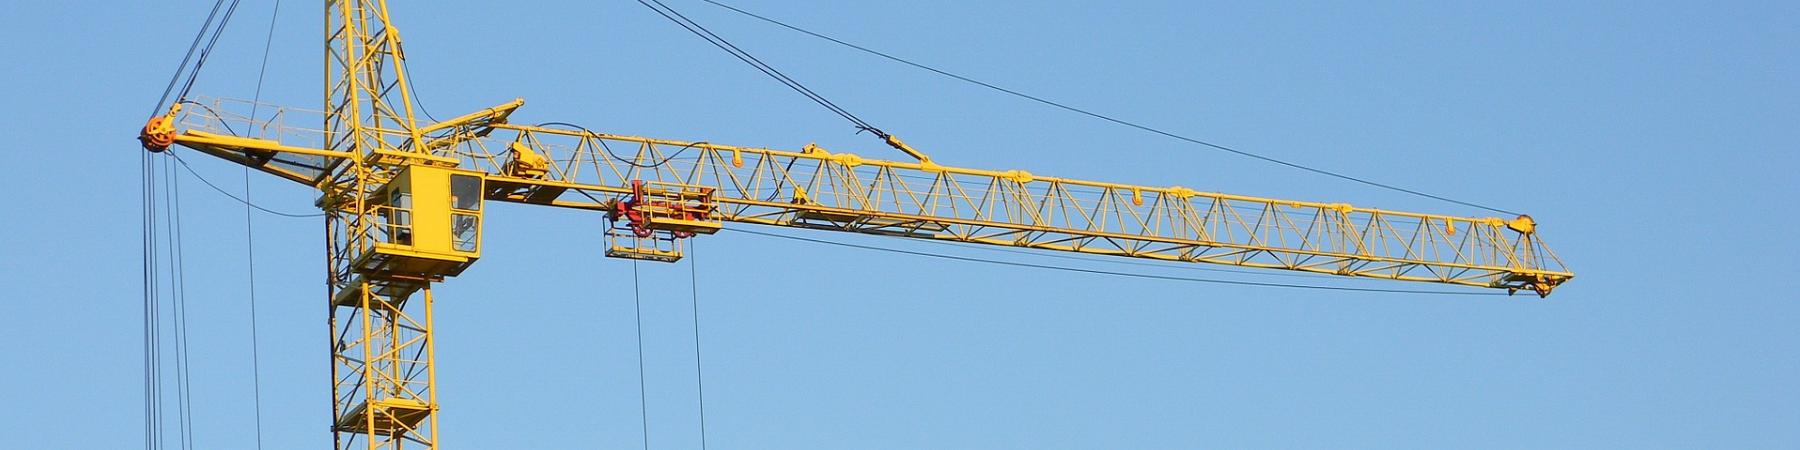 Qualified Crane Operator Training & Certification – Fostoria